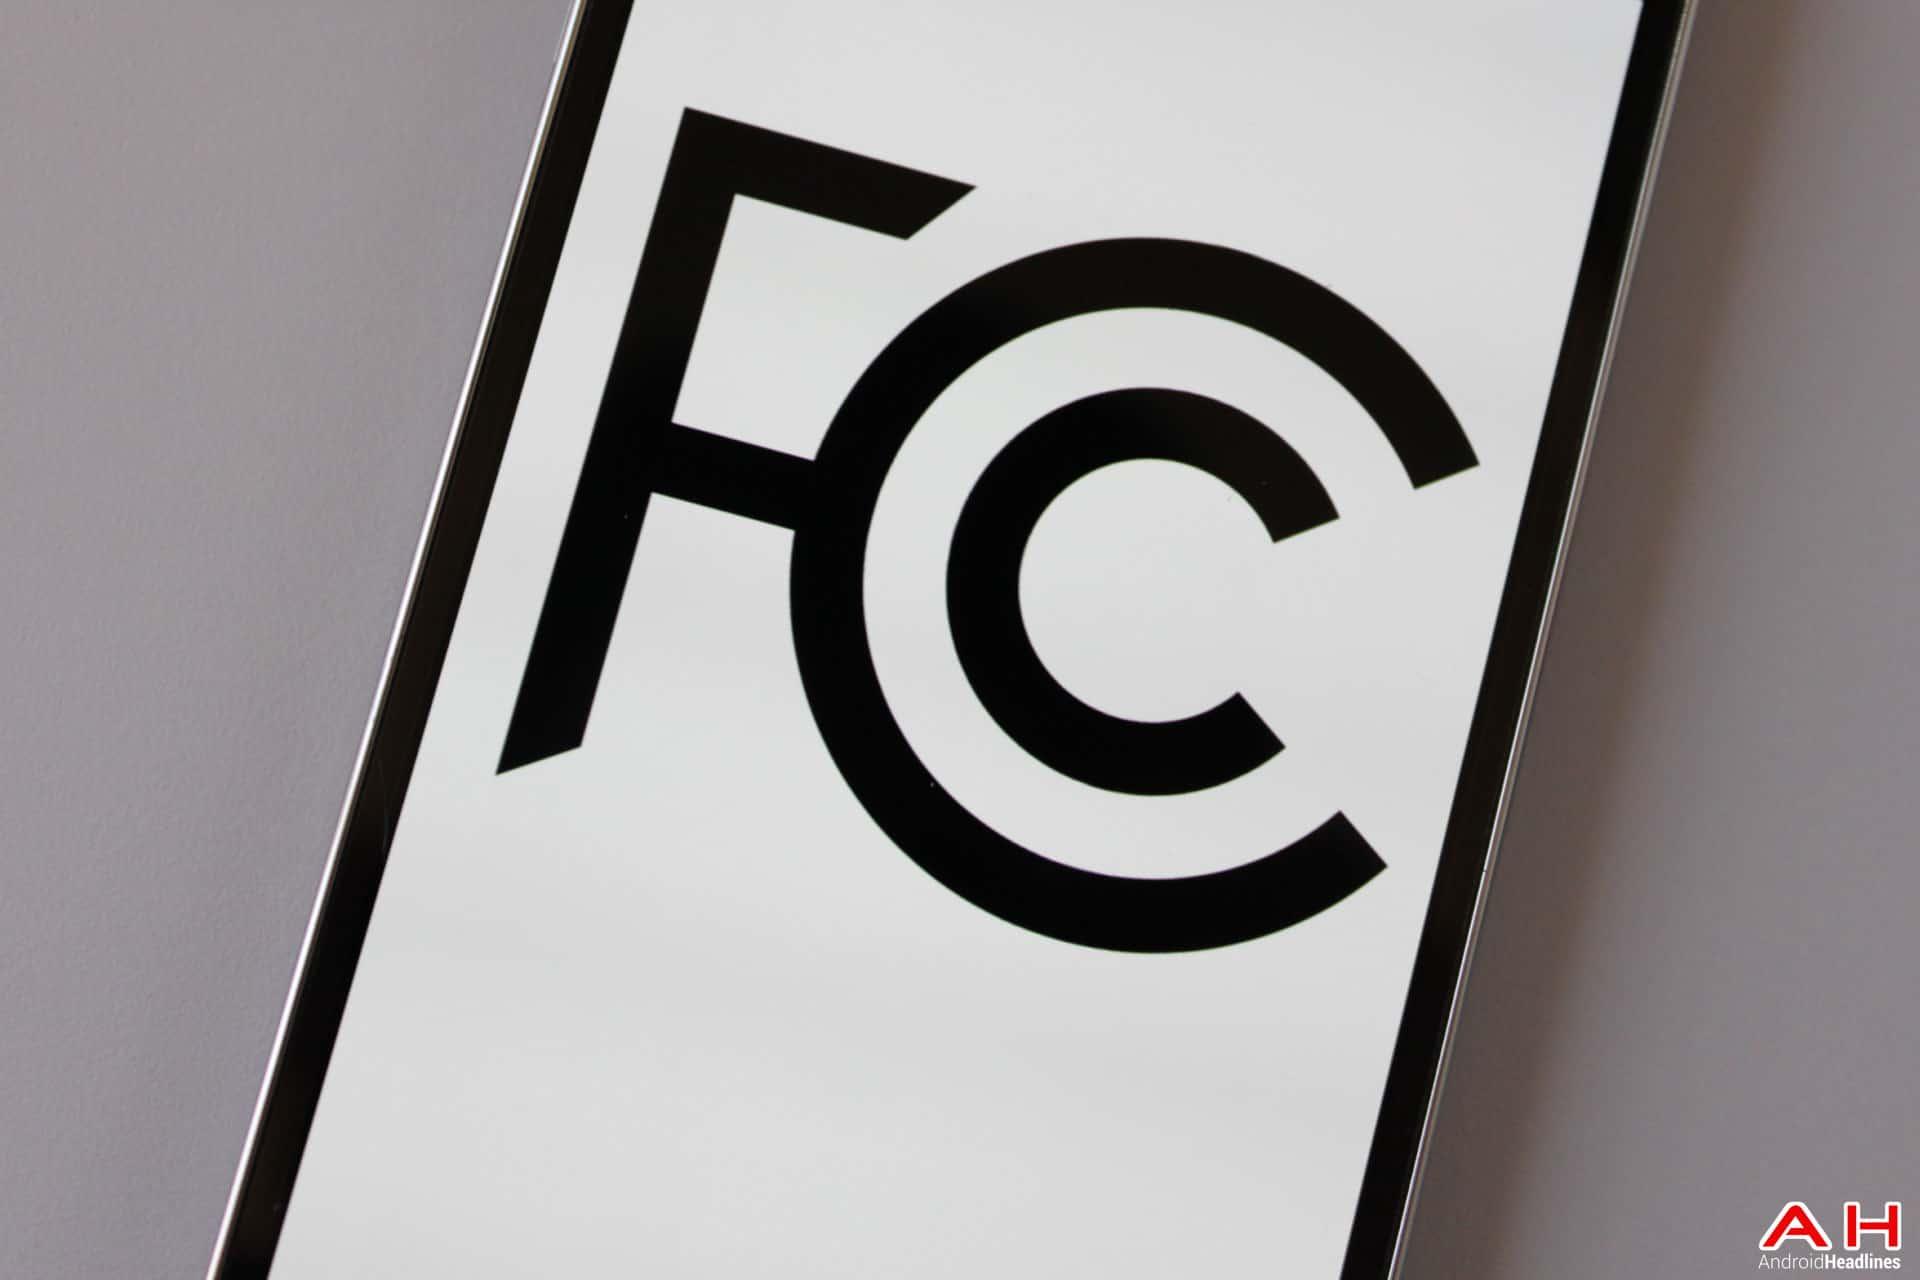 AH FCC LOGO 4